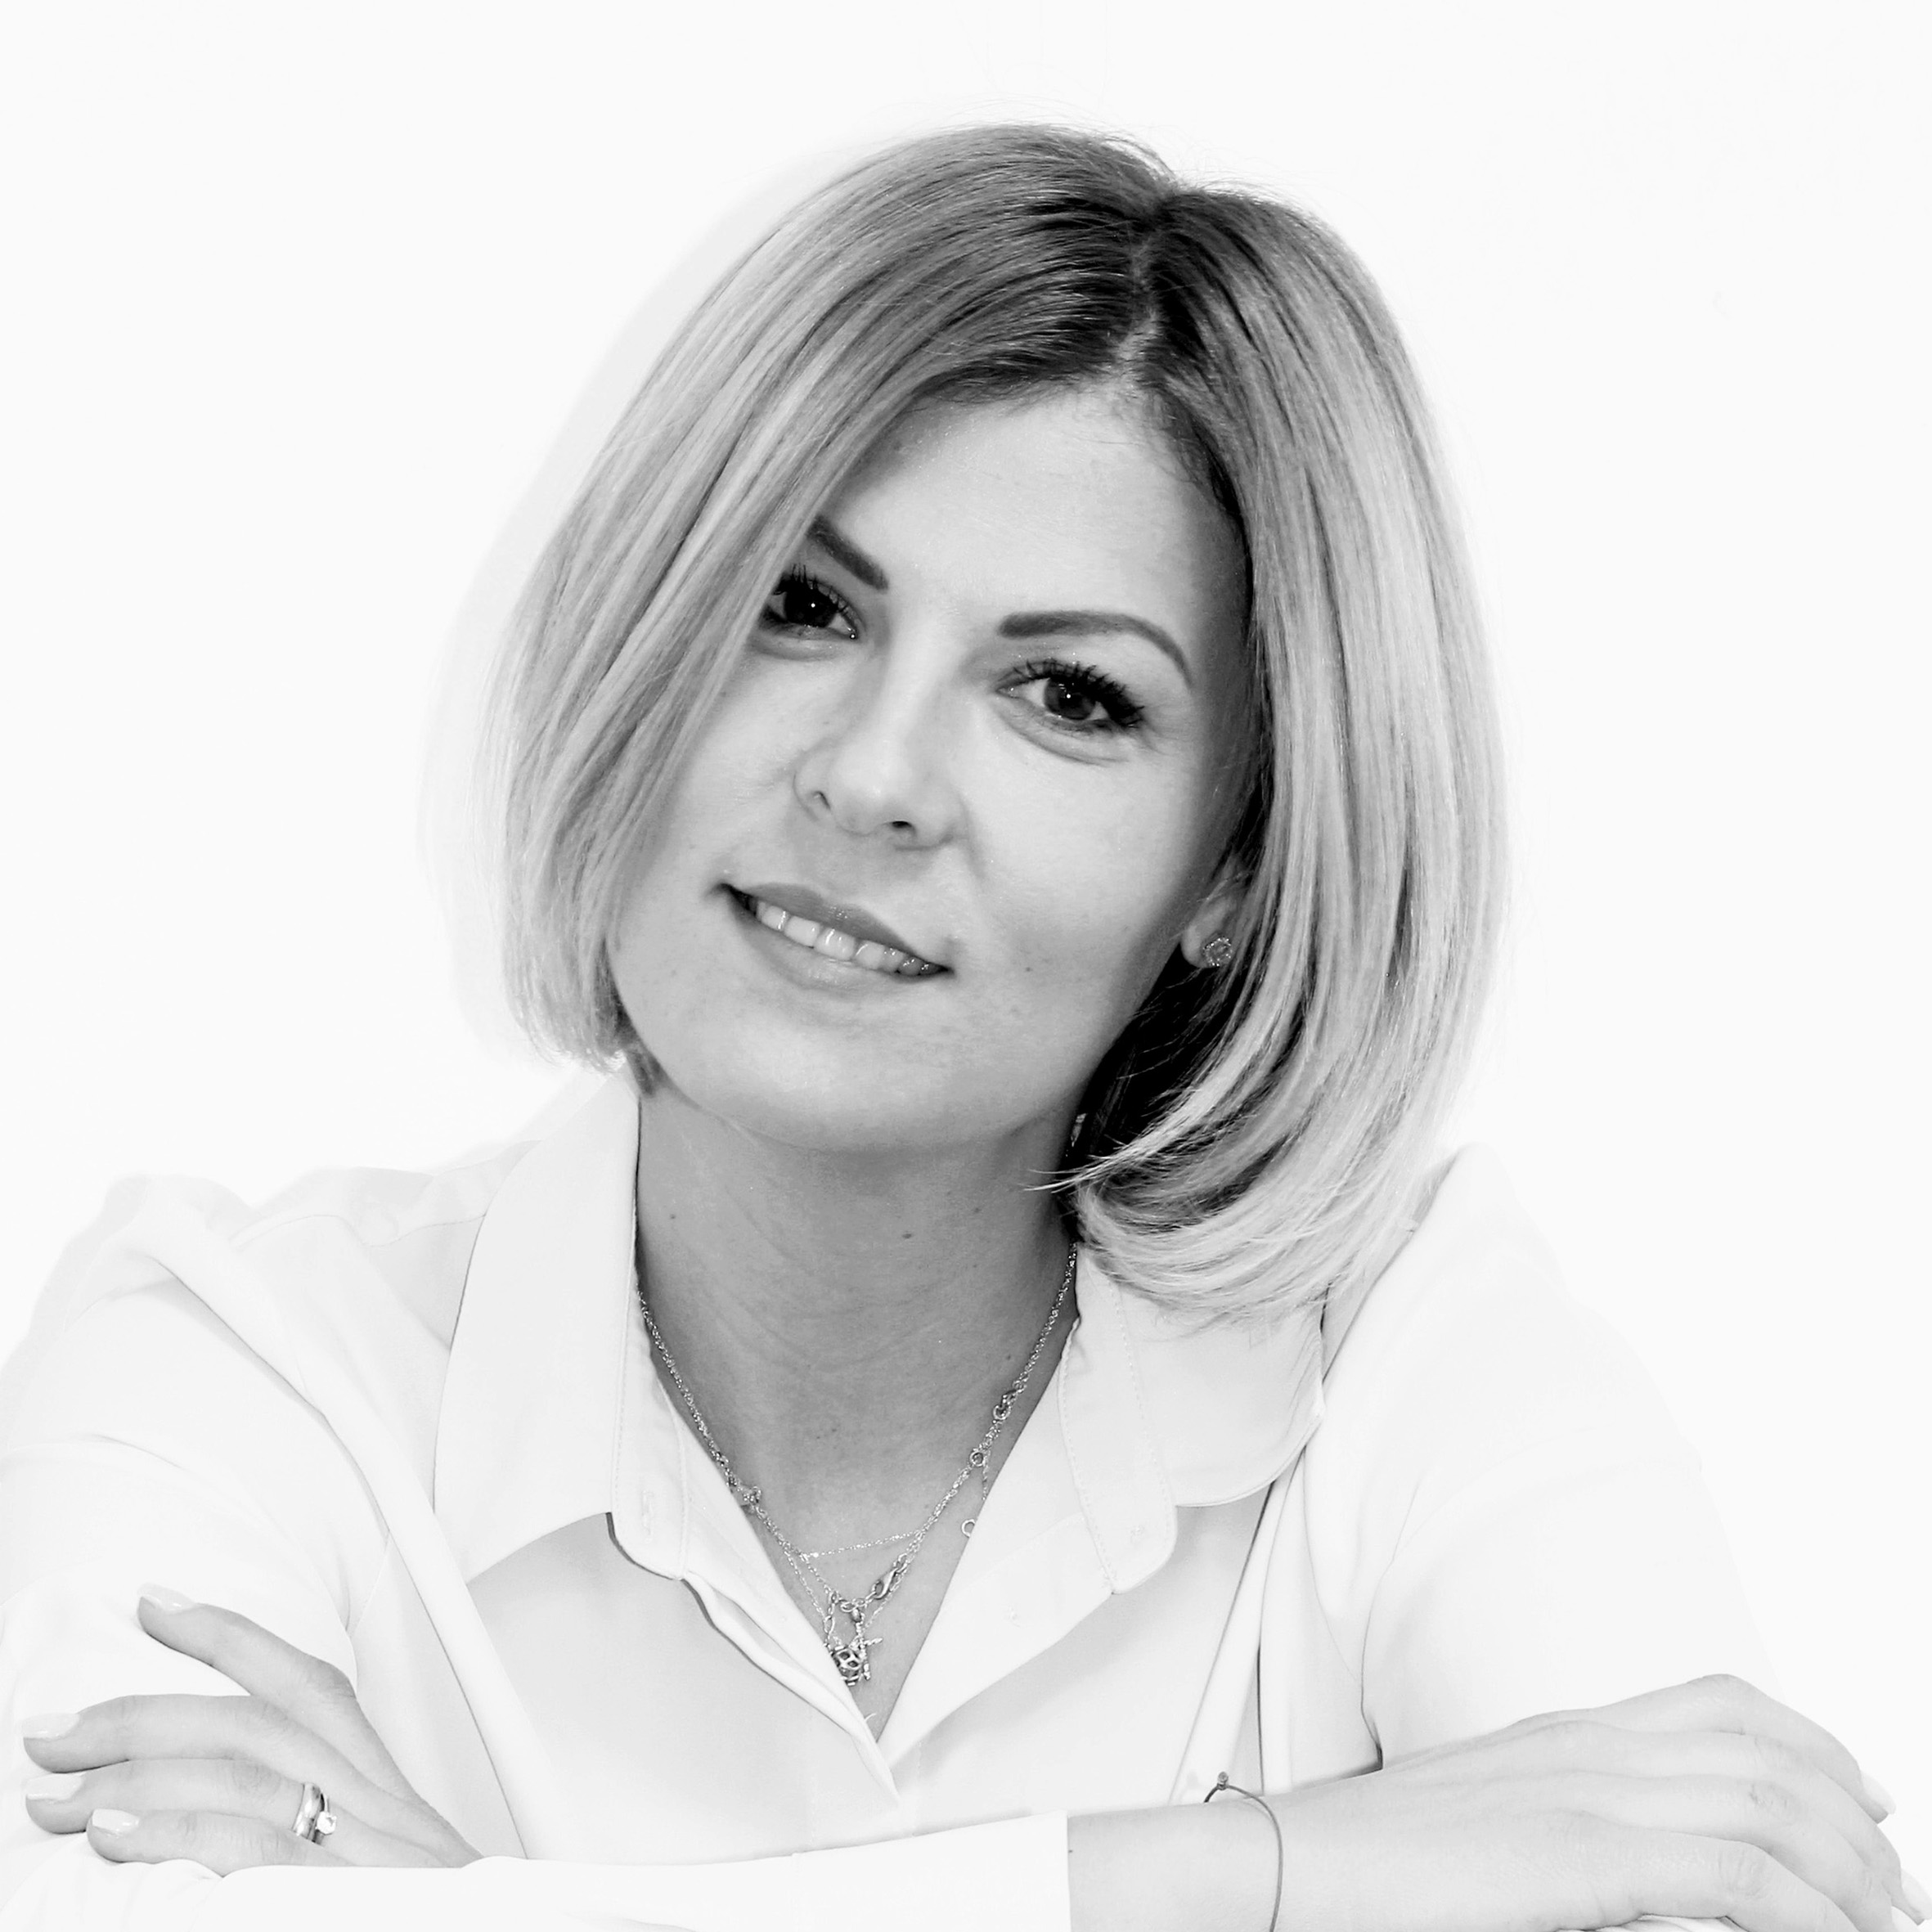 Cristina Stoianovici